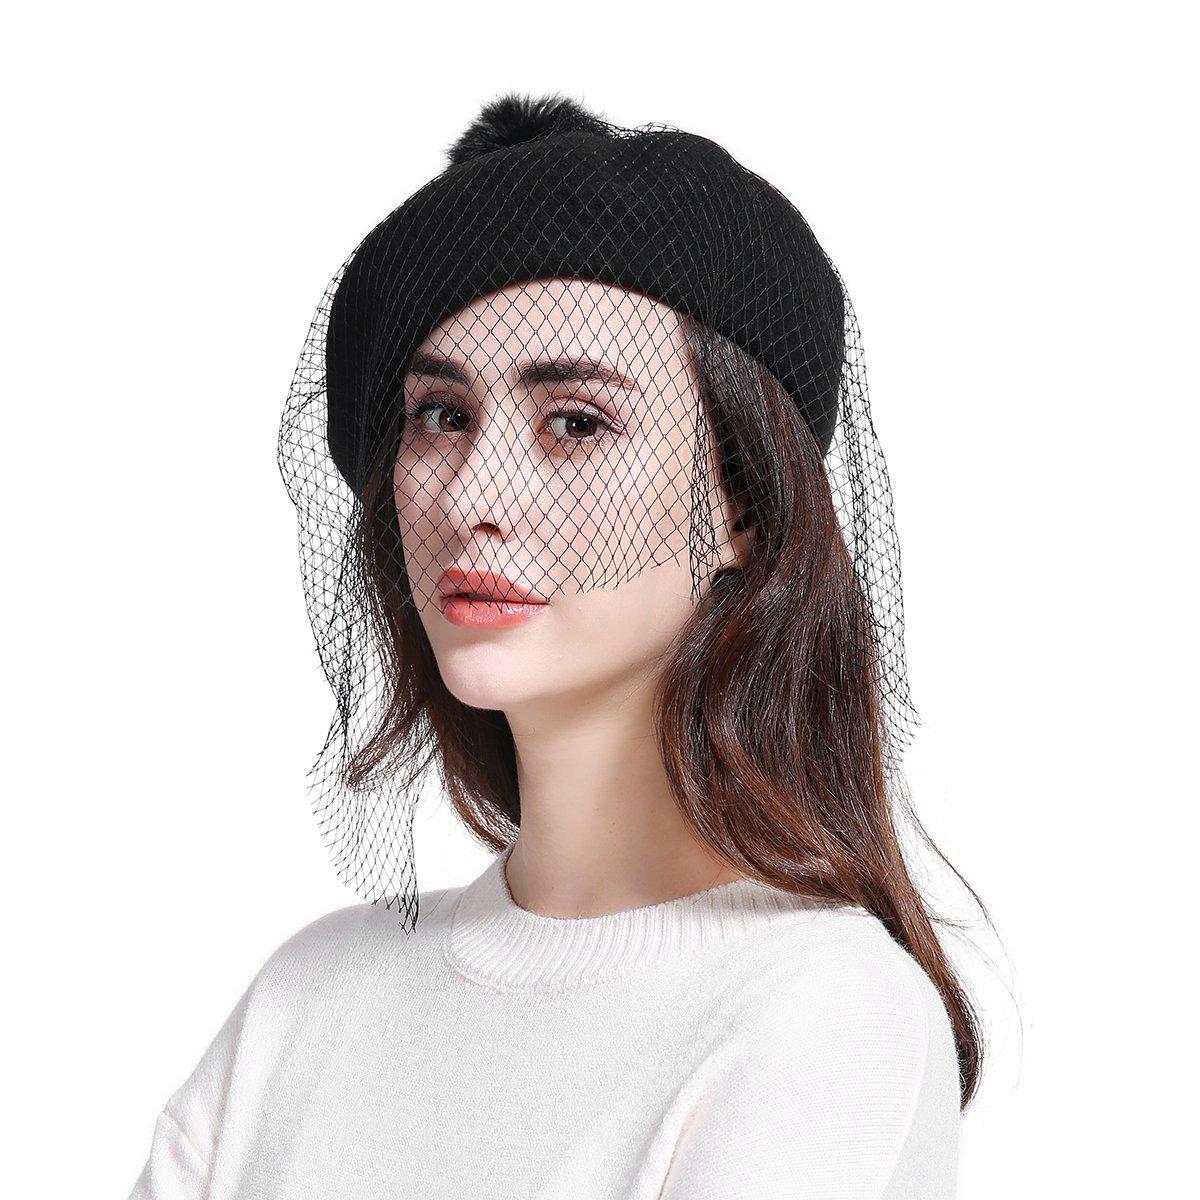 JOOWEN Women's Franch Inspired Wool Felt Beret Hat with Veil Cocktail Hat (Pom-Black)